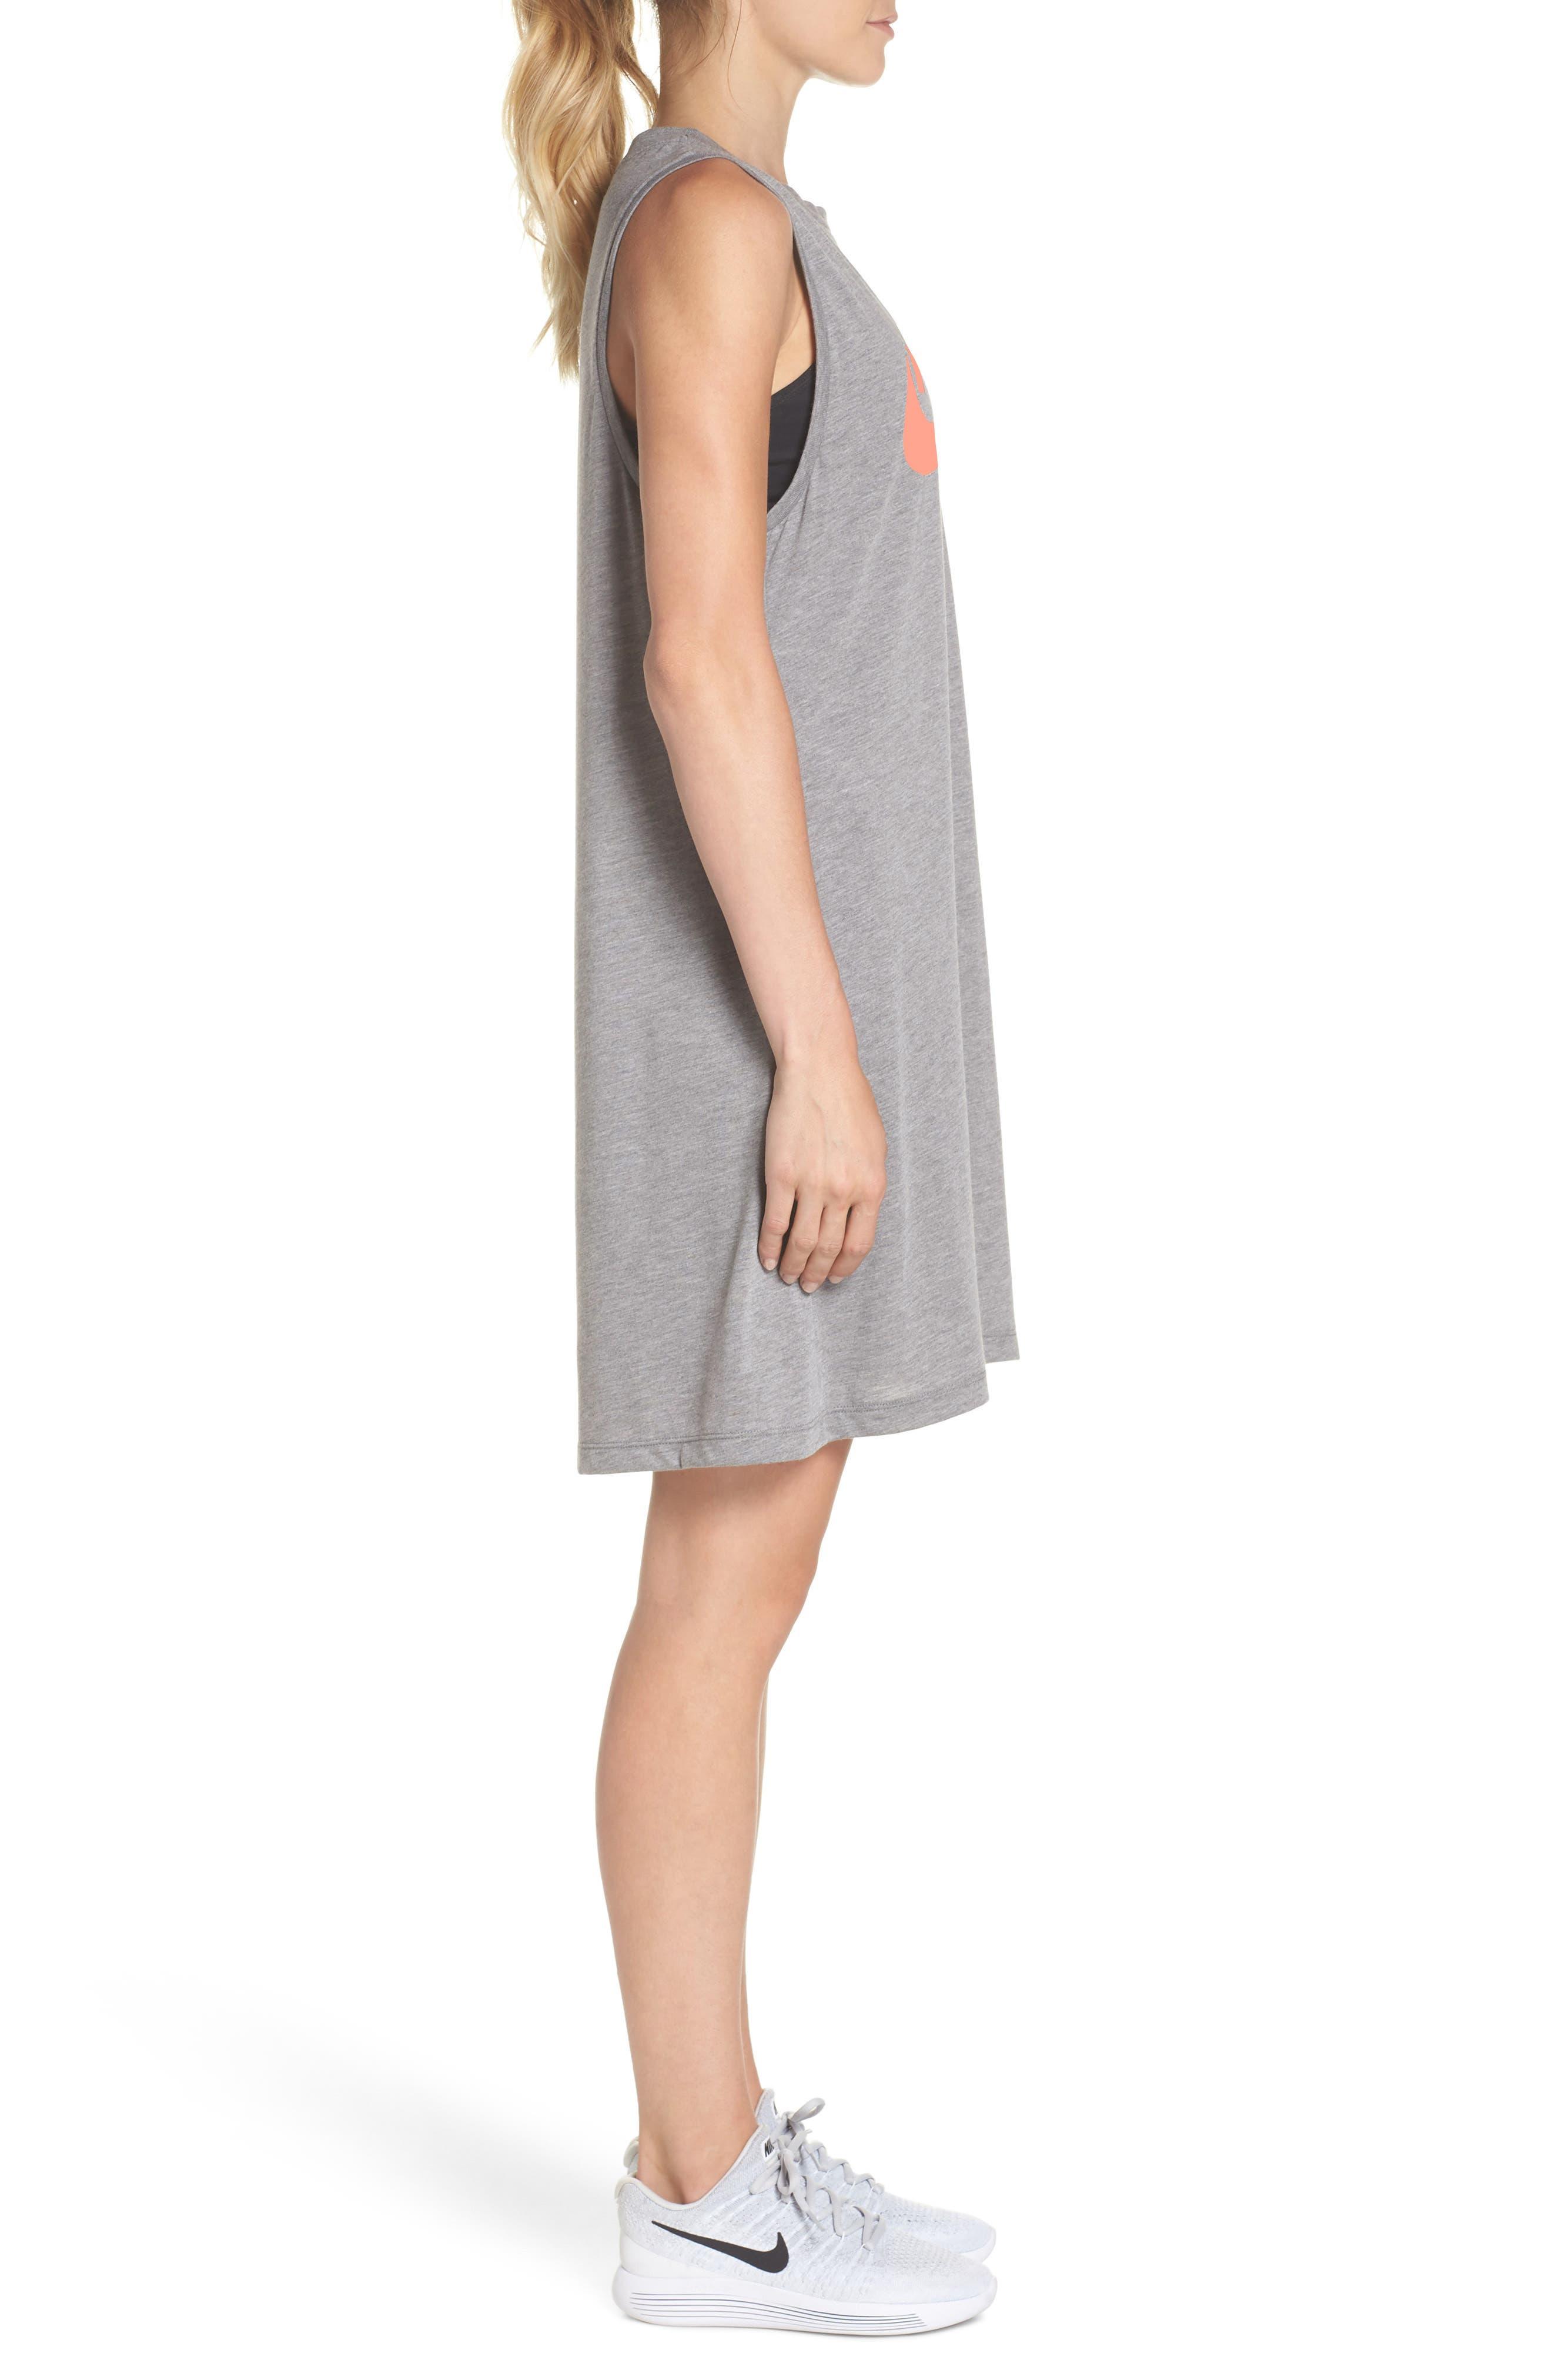 Sportswear Sleeveless Dress,                             Alternate thumbnail 3, color,                             Carbon Heather/ Crimson Pulse